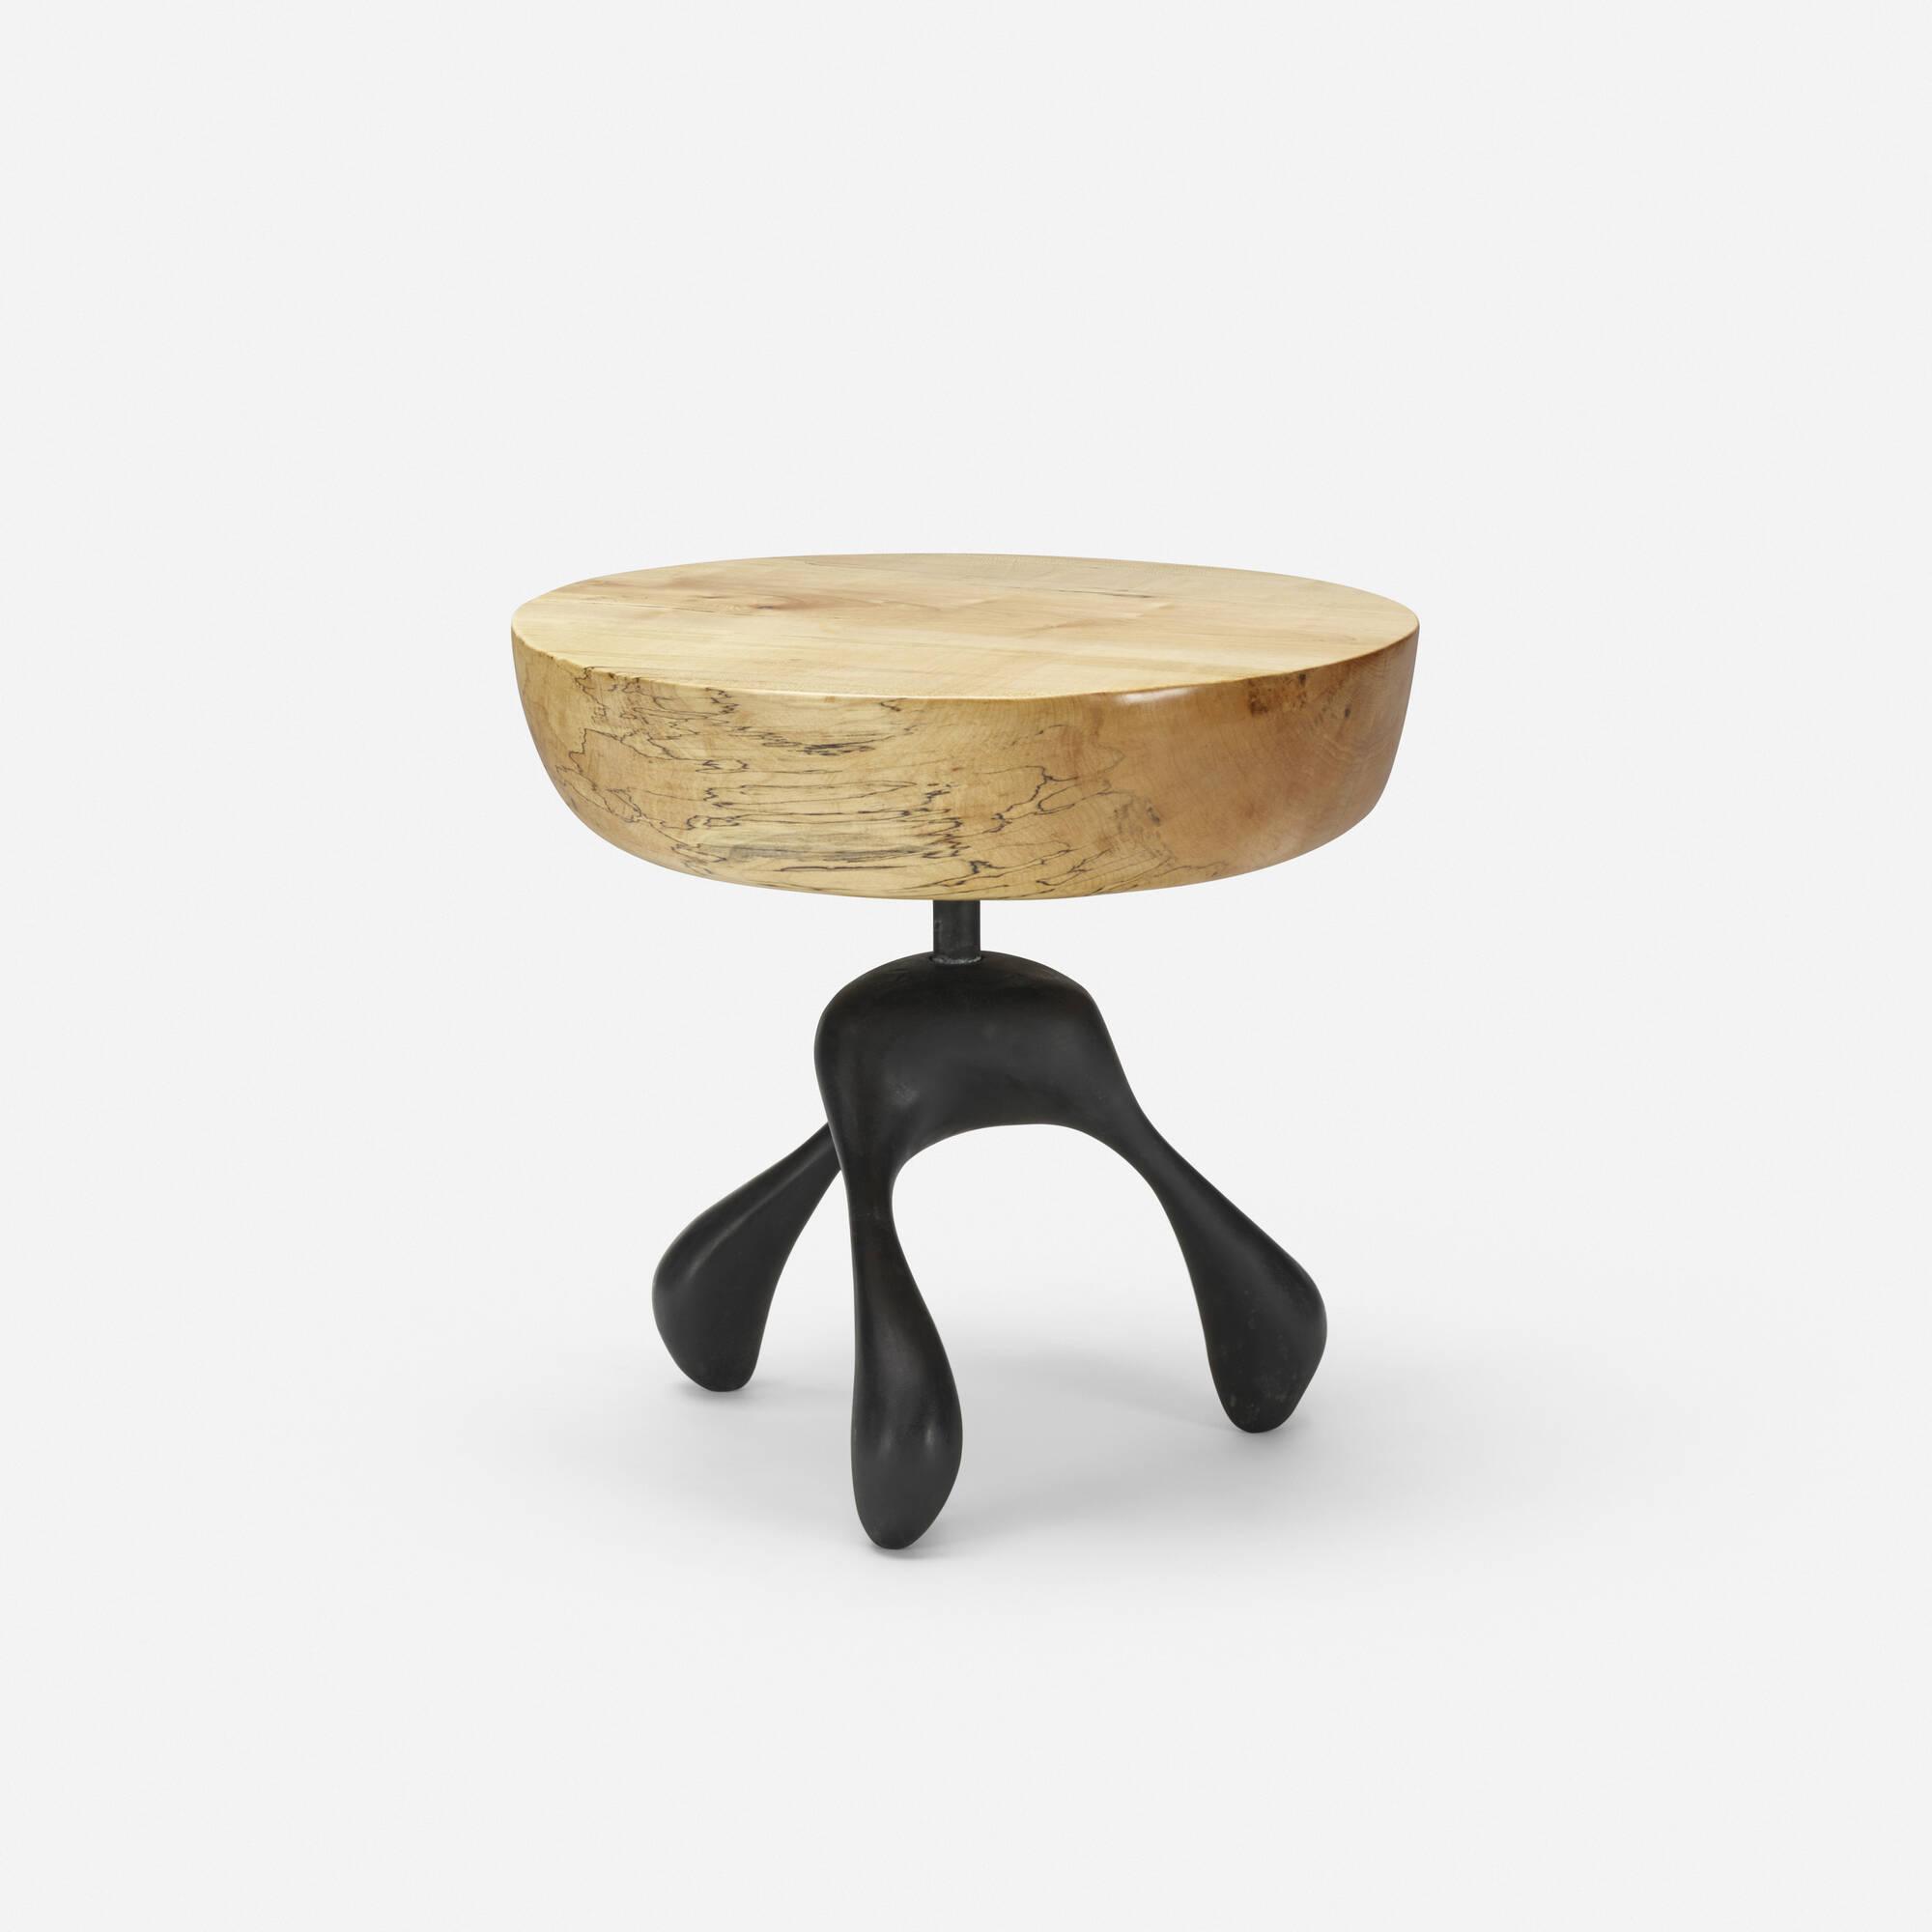 191: Jordan Mozer / prototype Musashi occasional table (1 of 2)